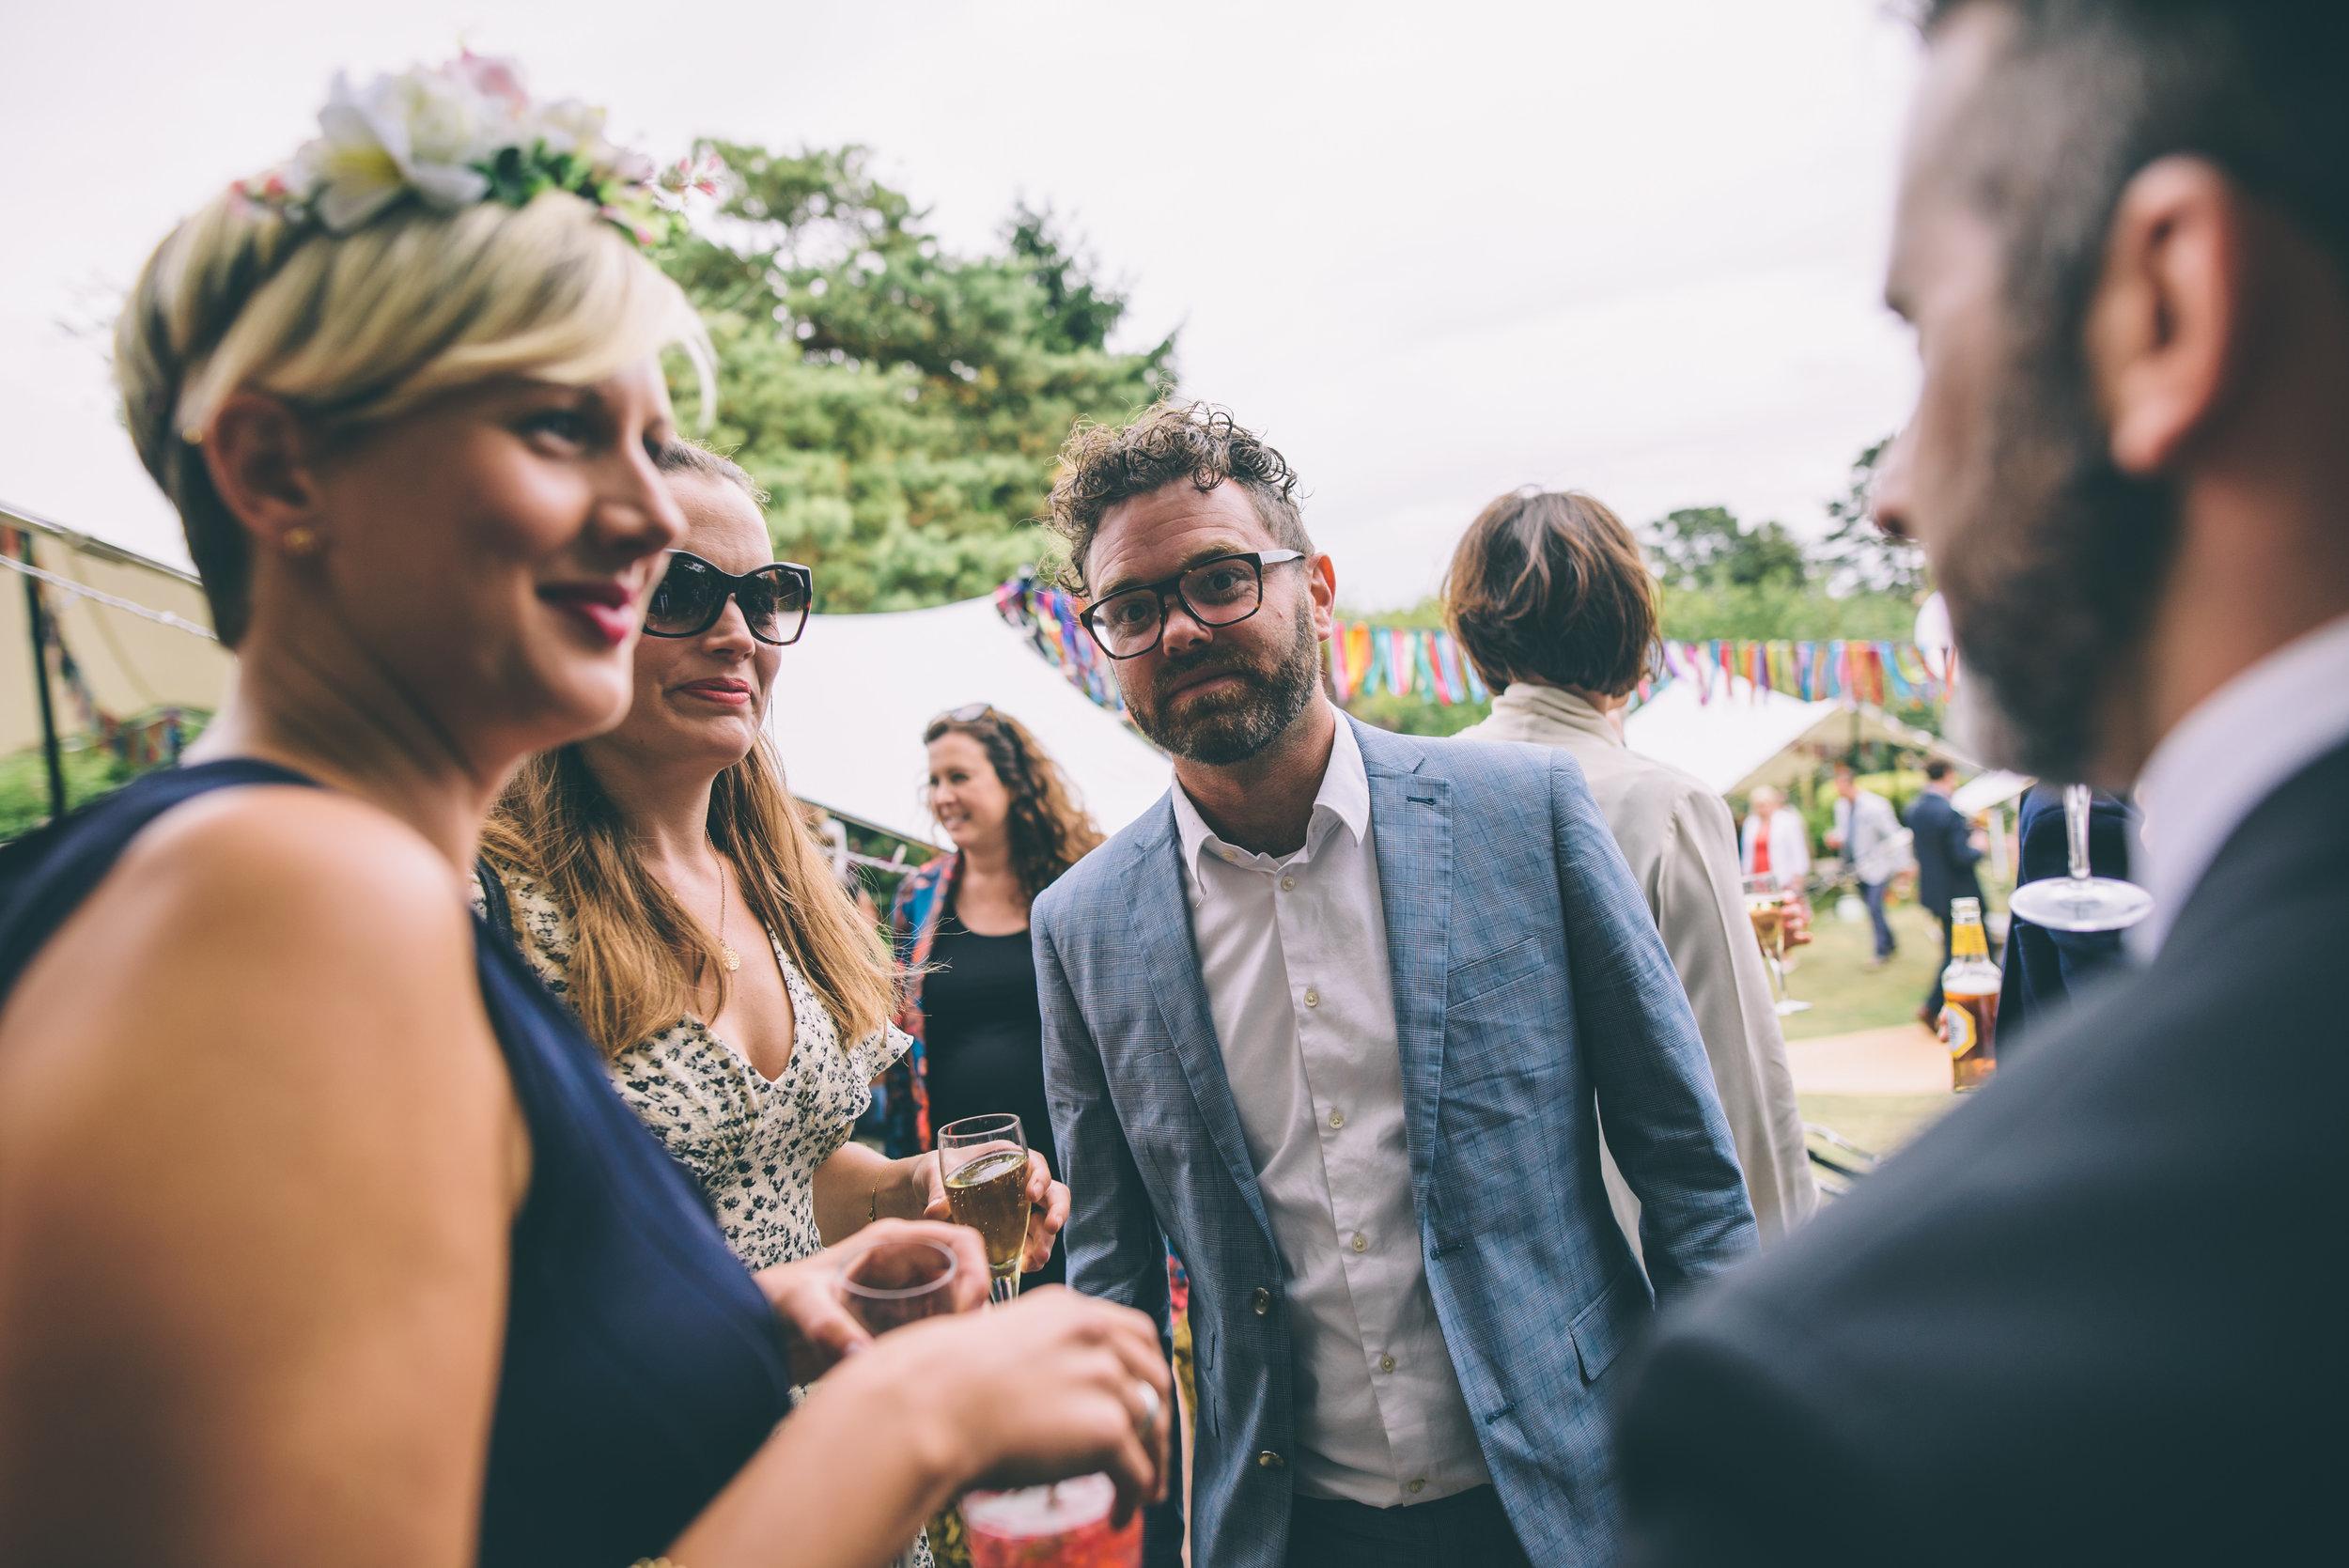 Garden Wedding photography Barley Herefordshire - Tracy + Matt -251.jpg